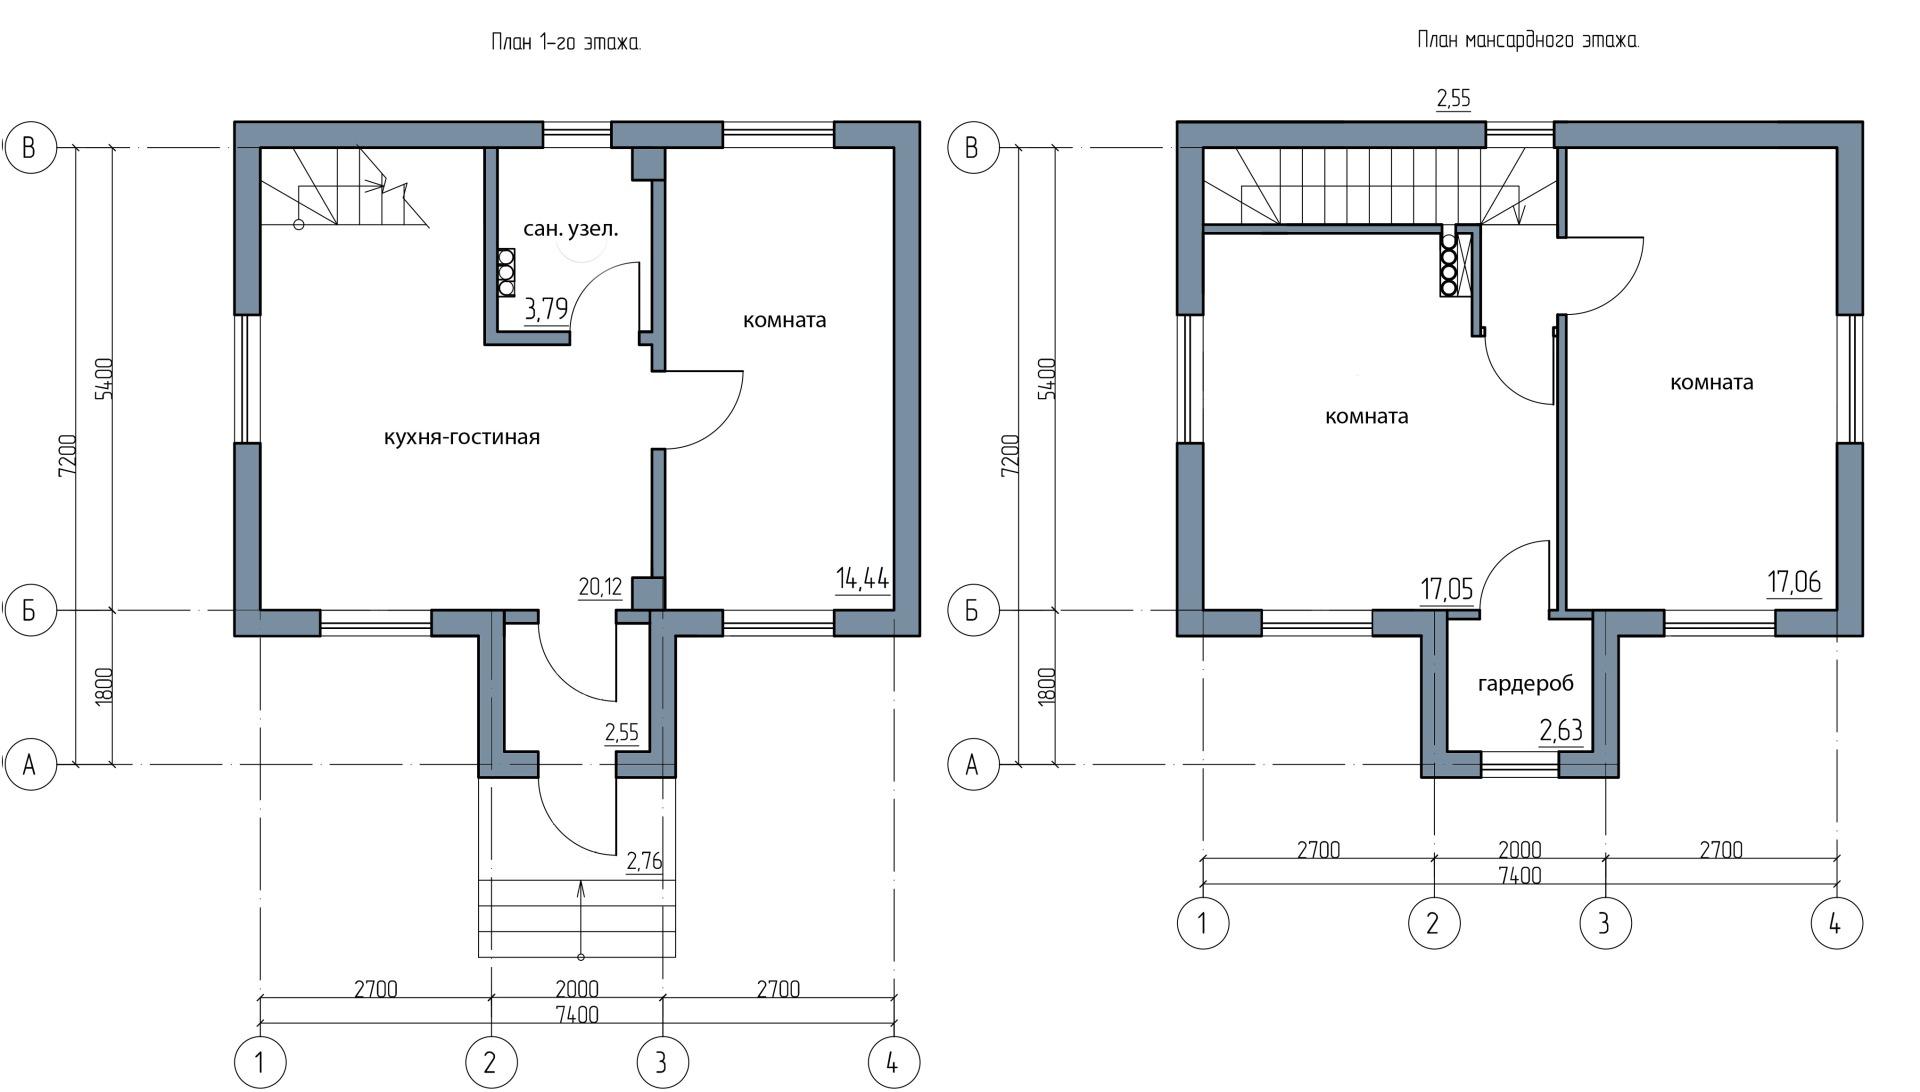 проект дома строительство дома под ключ в иваново